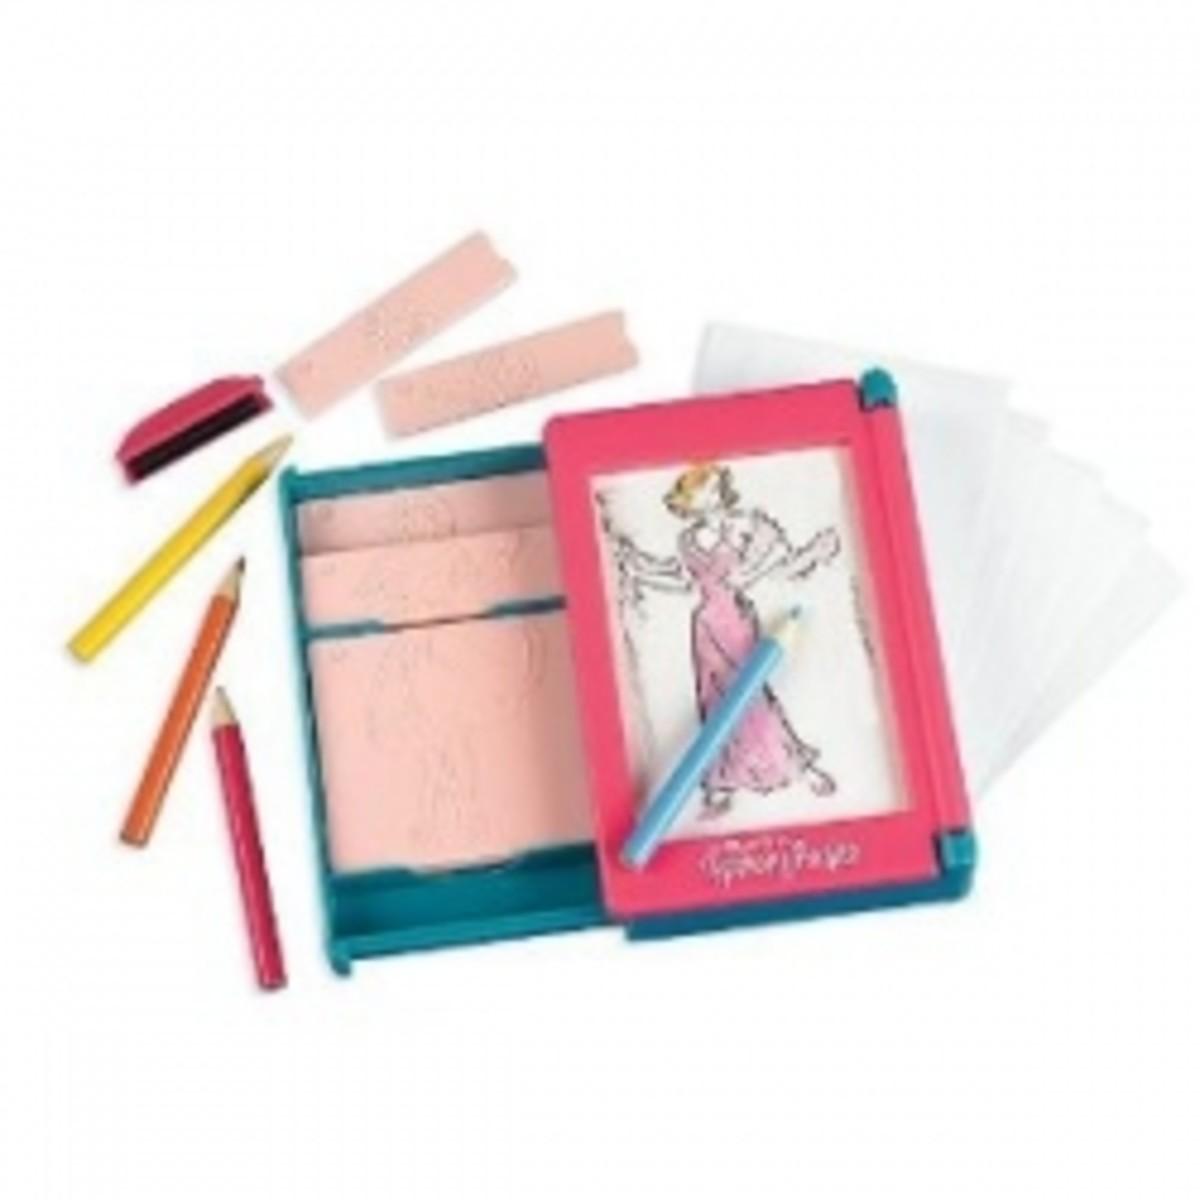 Schylling Pocket Fashion Designer old fashioned gifts for girls